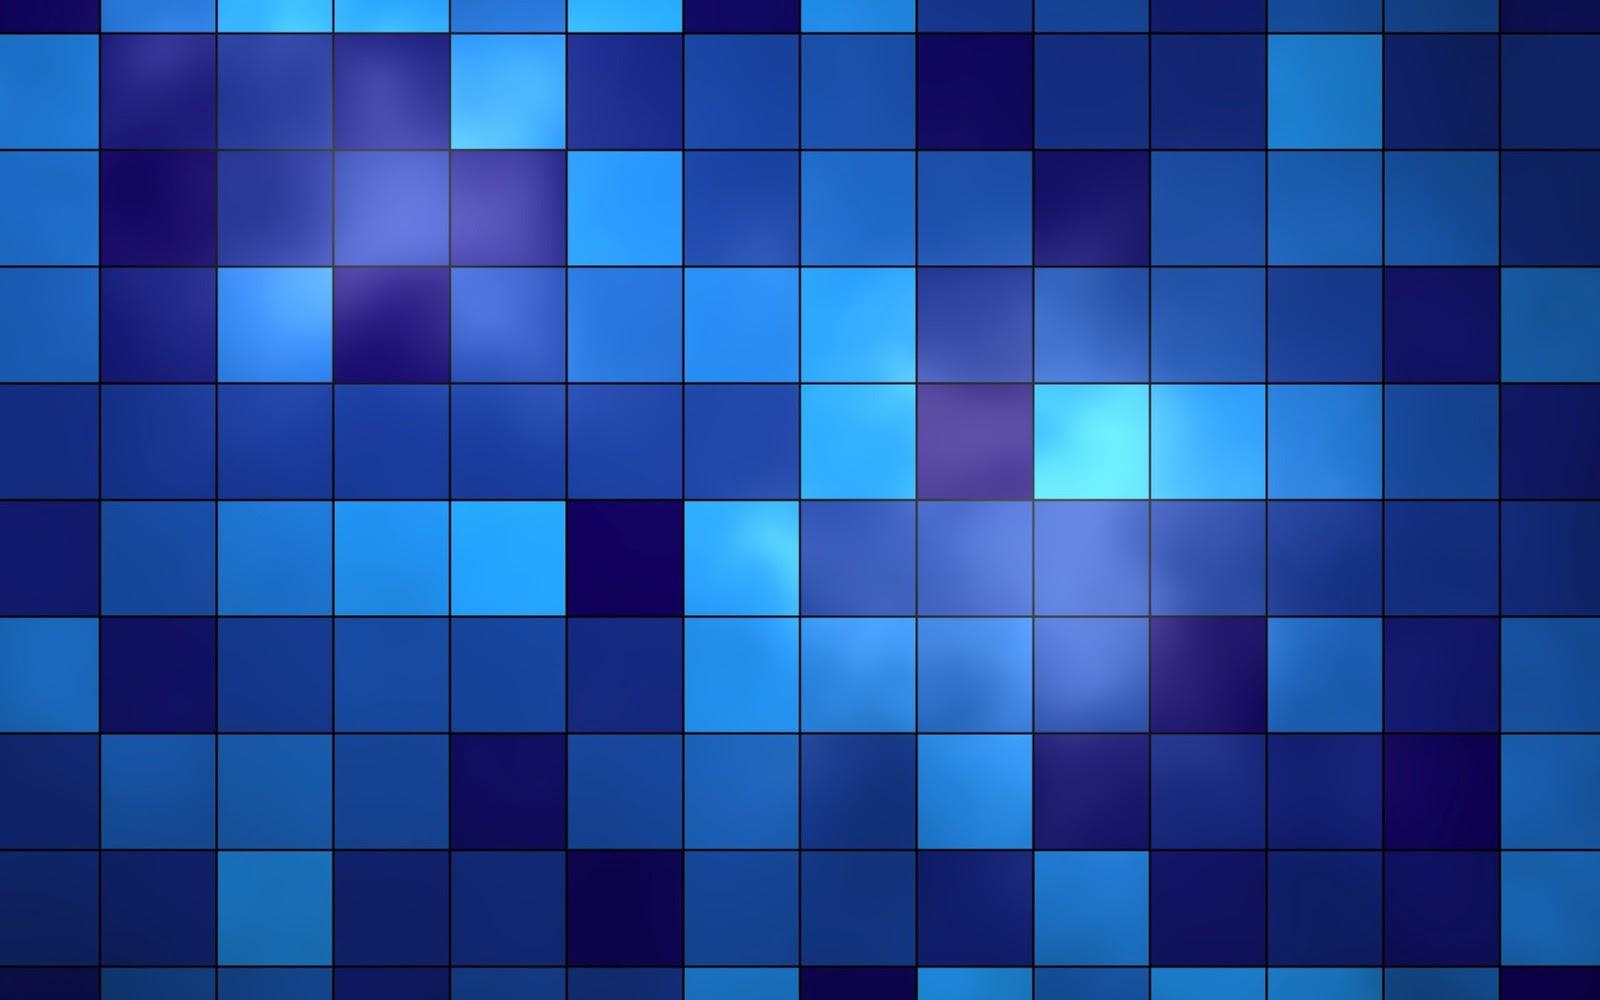 3d Islamic Wallpaper Free Download For Mobile Hd Blauwe Achtergronden En Foto S Mooie Leuke